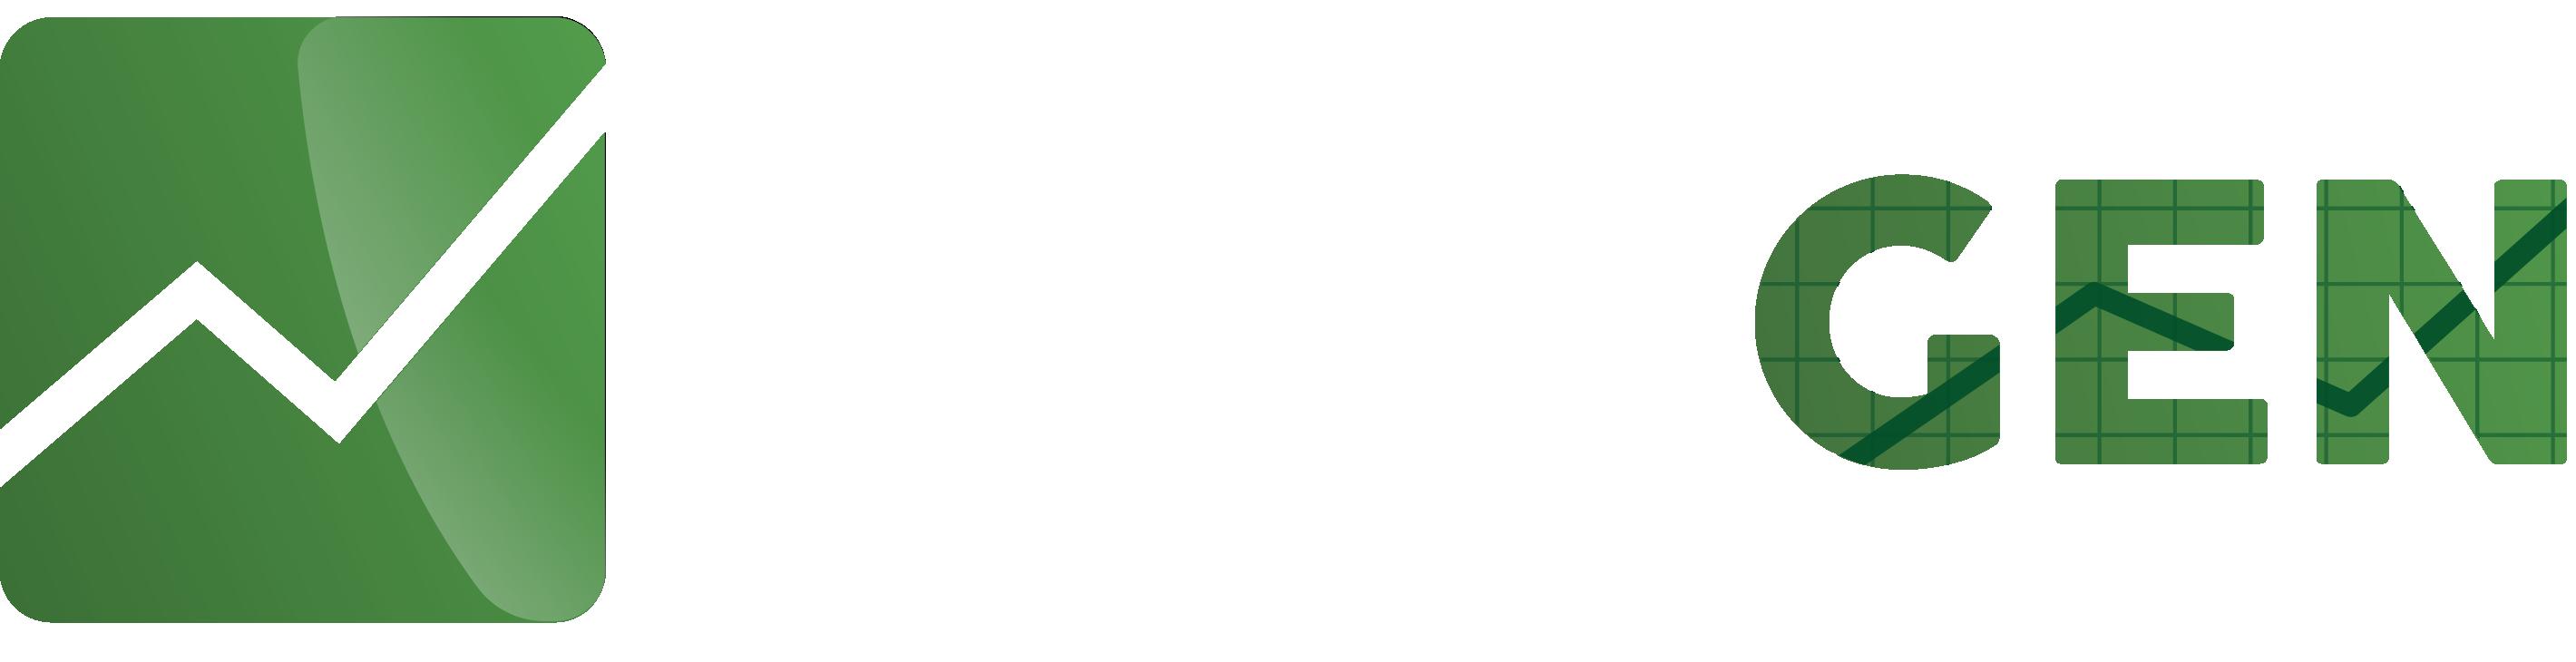 Accounts NextGen